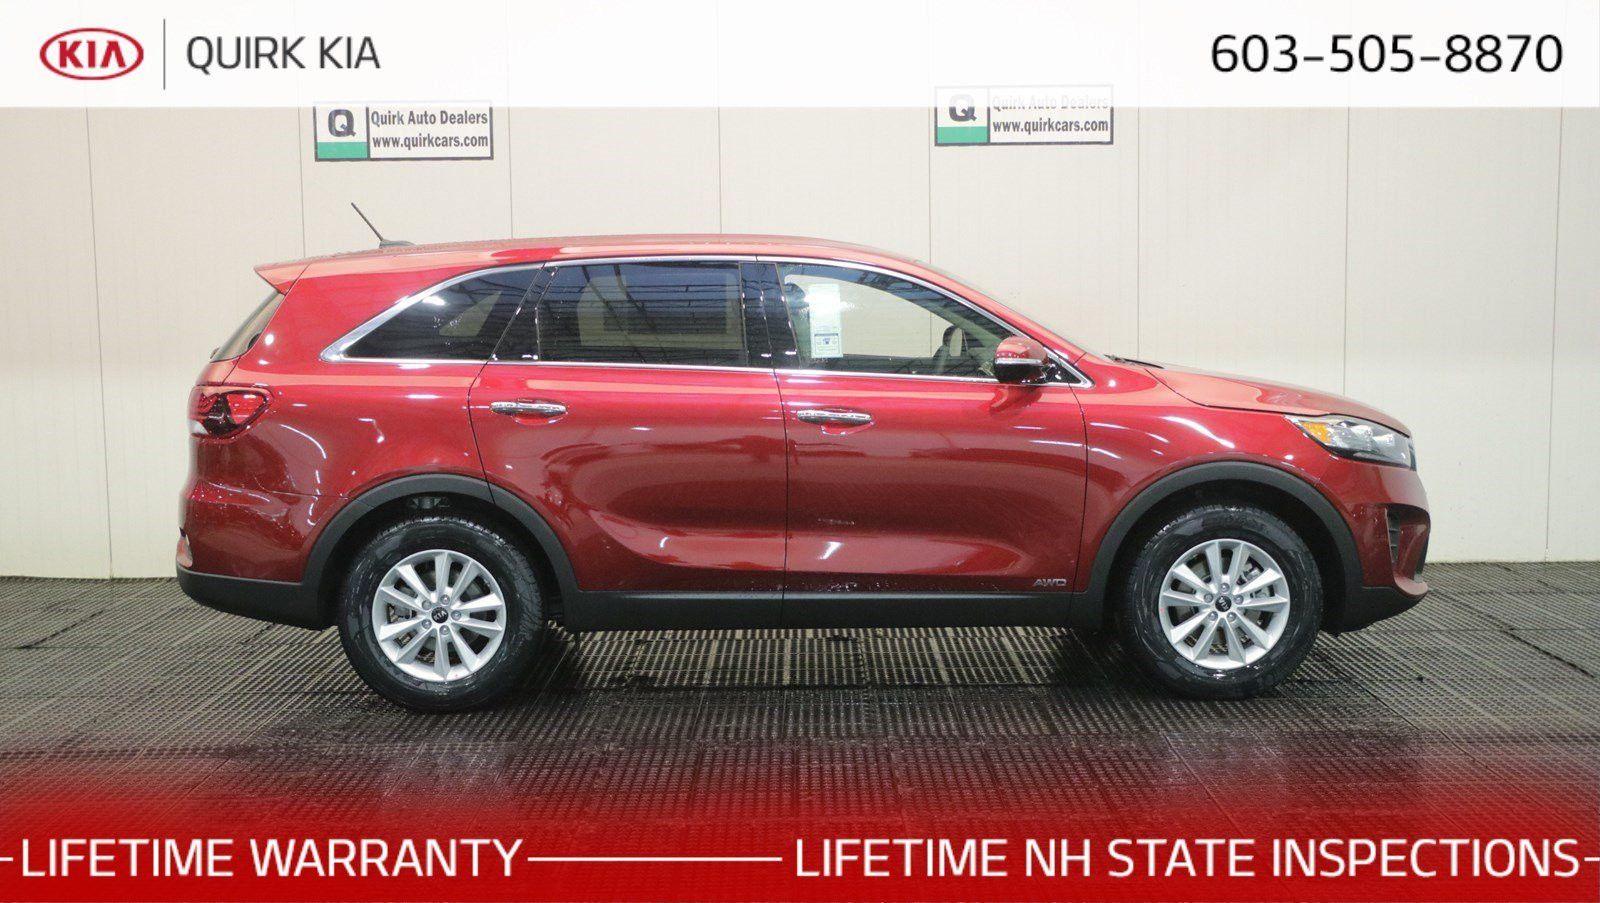 2021 Kia Sorento Warranty - NEWREAY